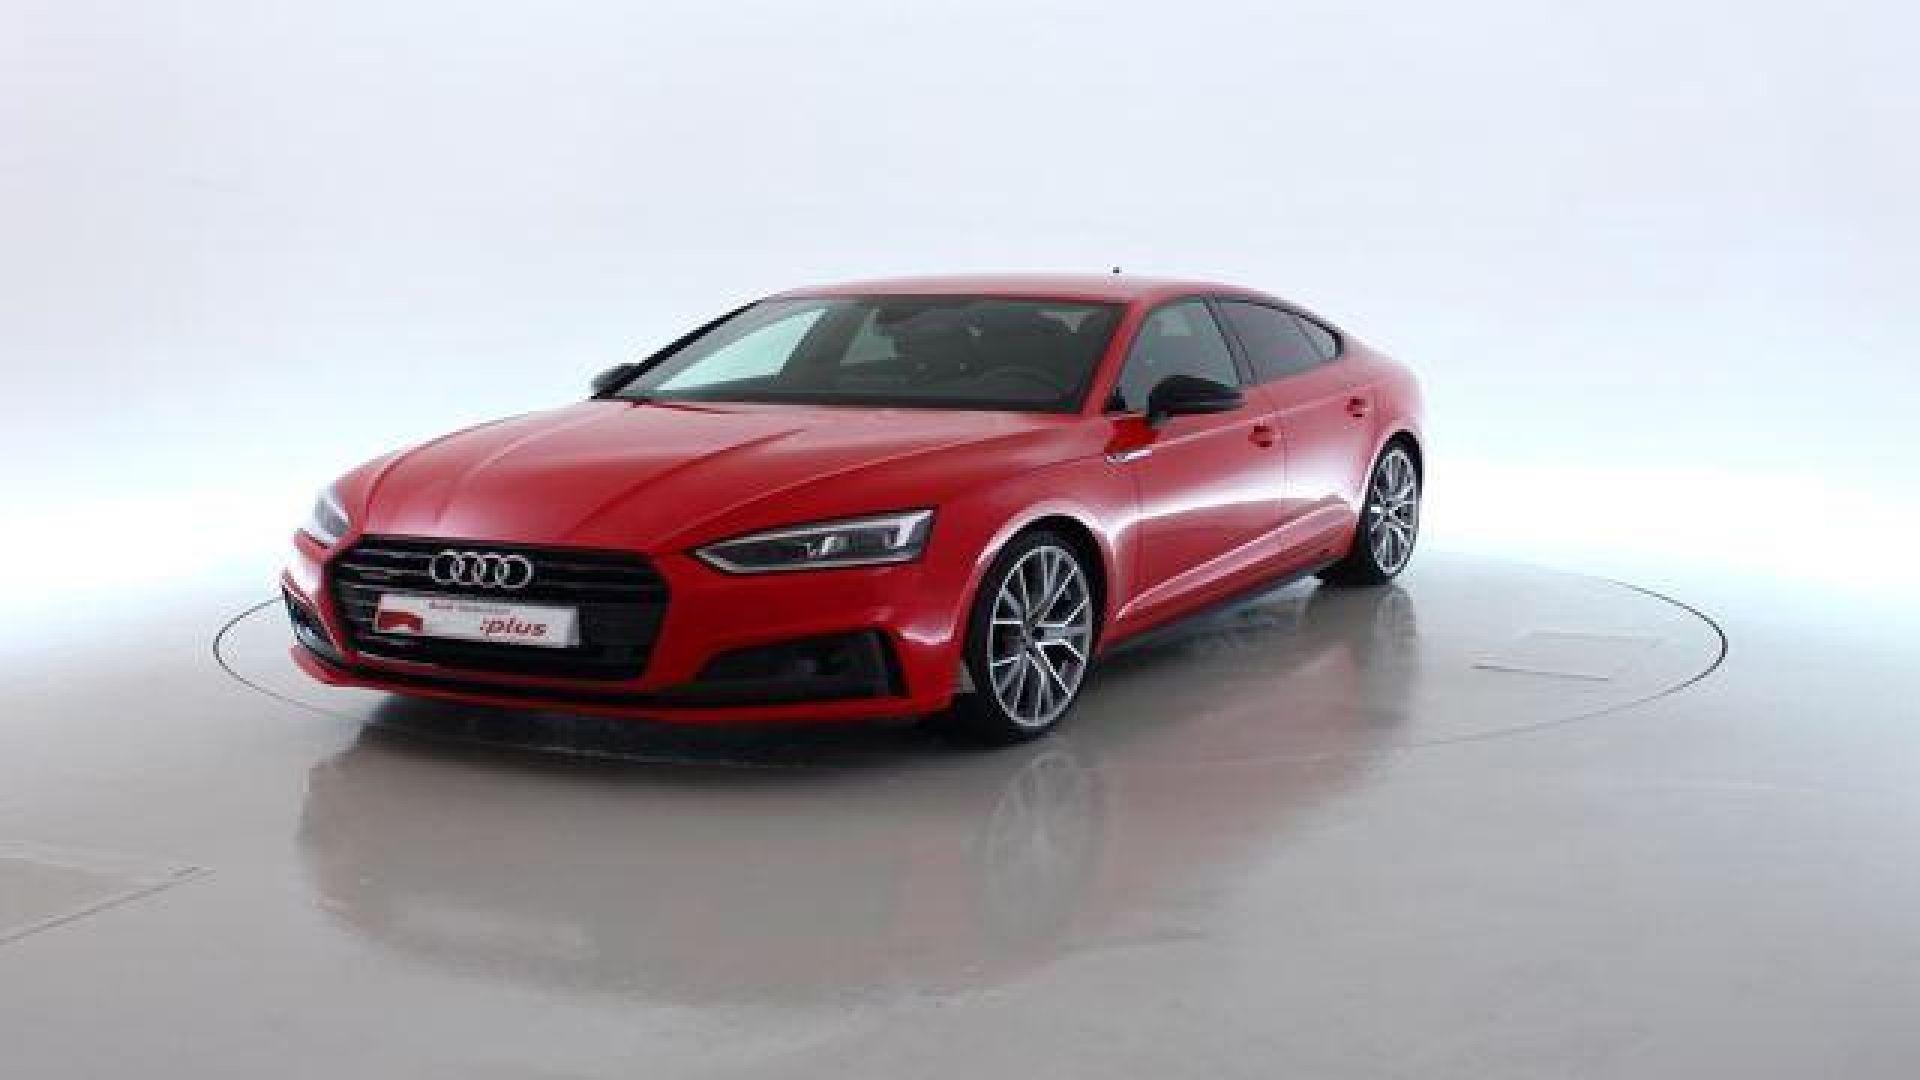 Audi A5 Sportback Black line 40 TDI quattro 140 kW (190 CV) S tronic